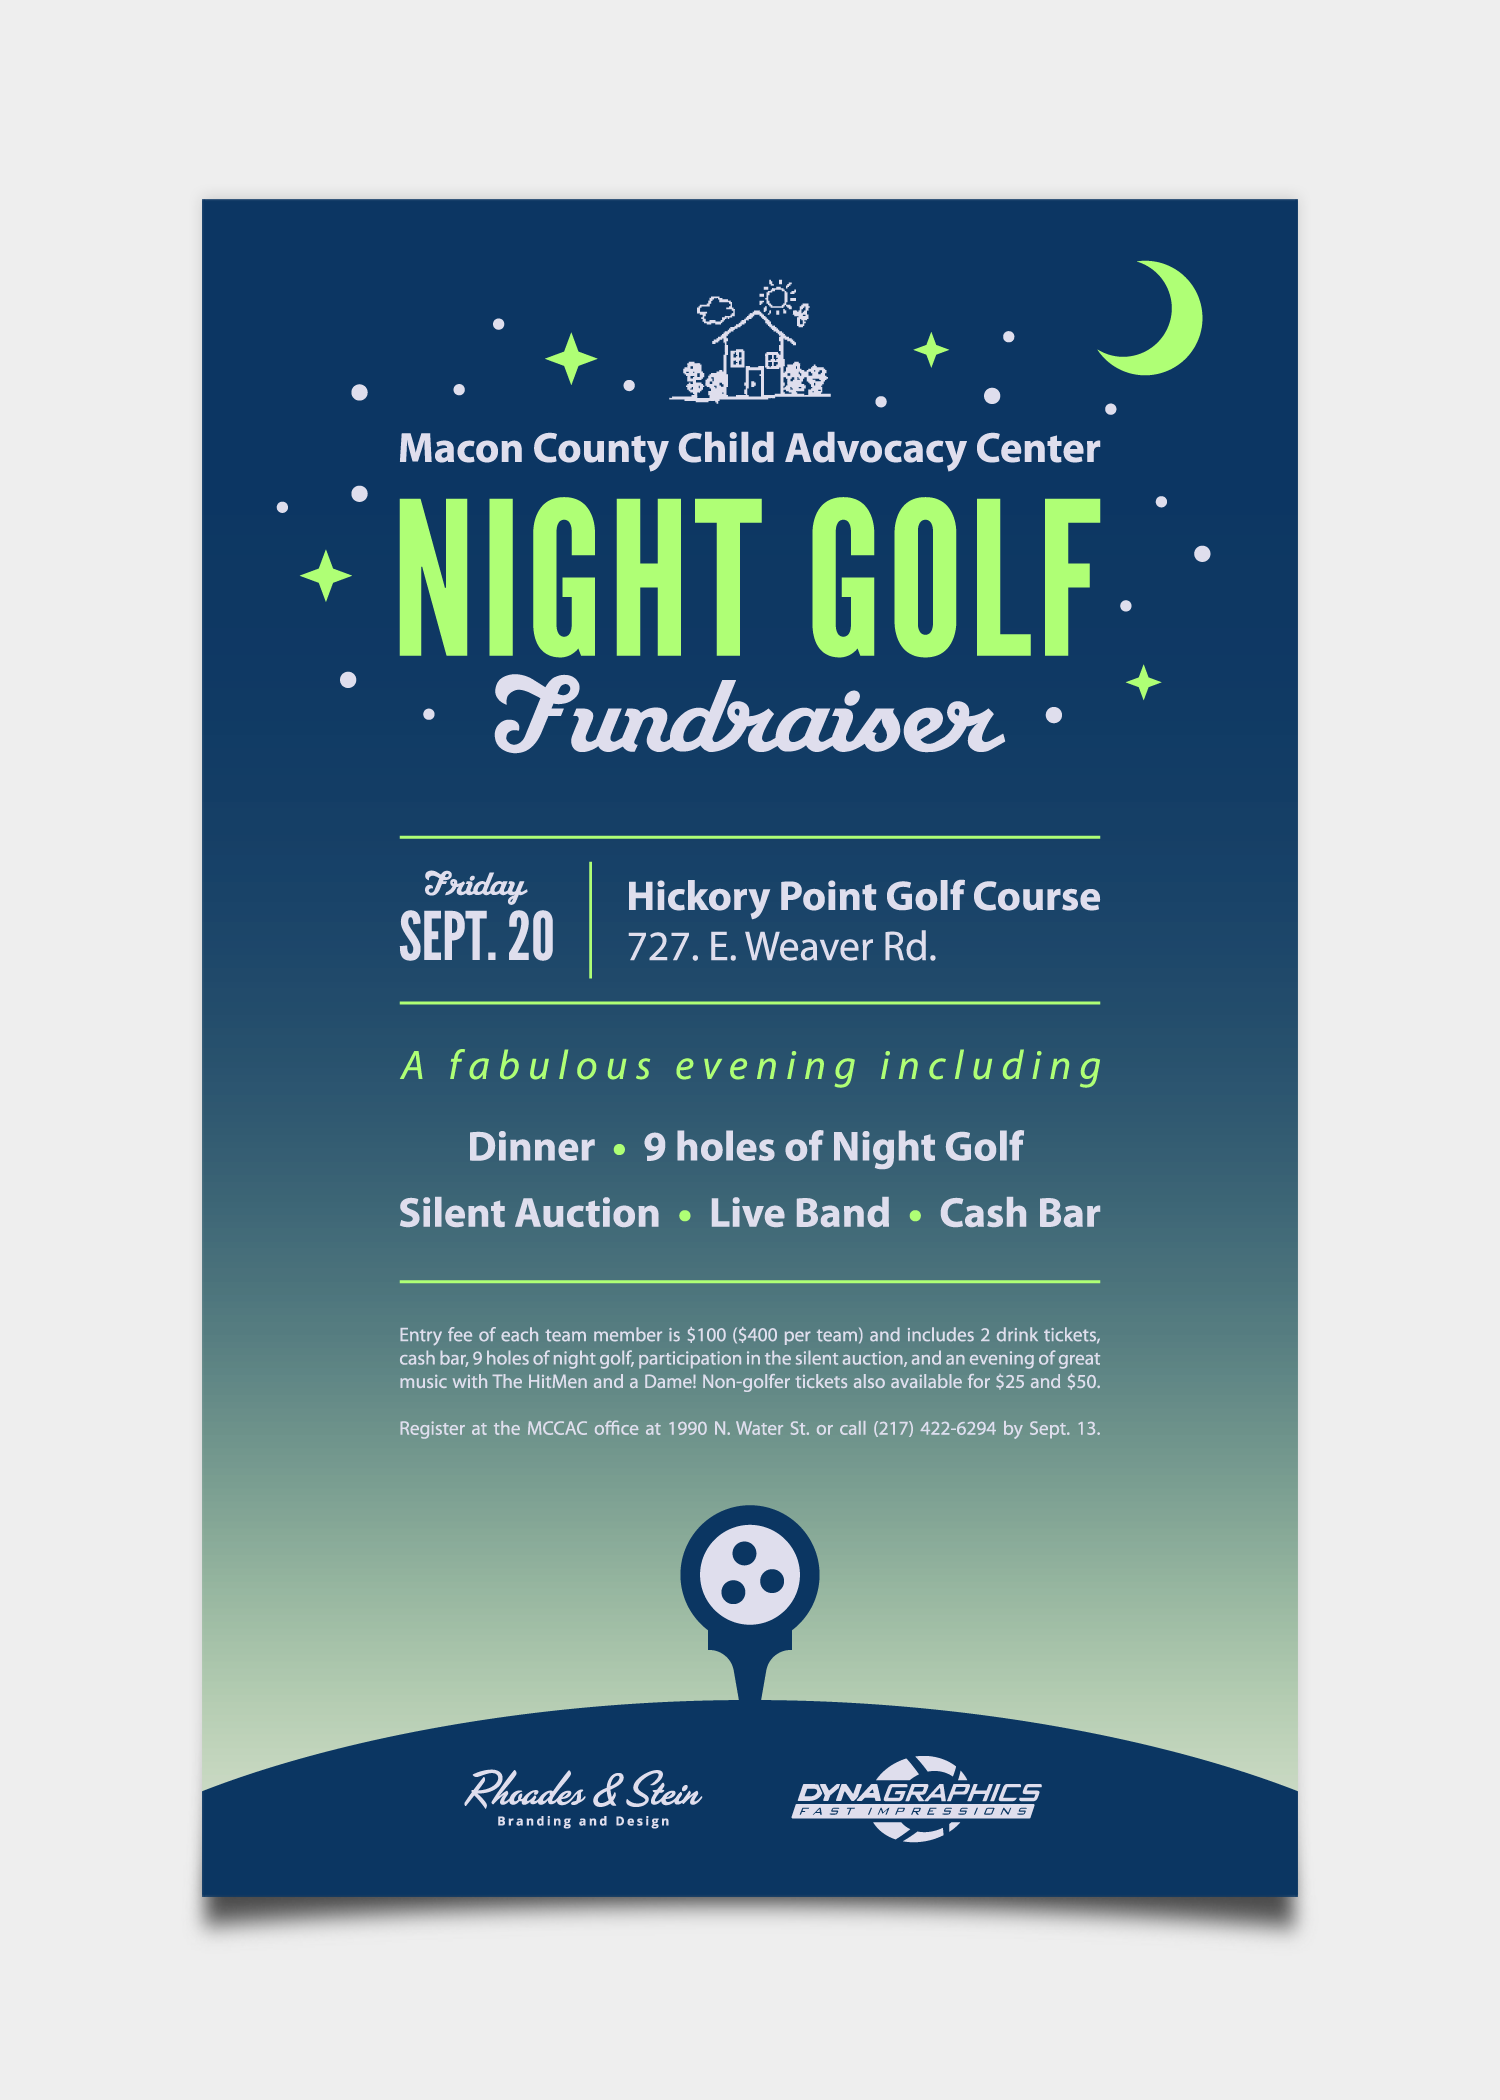 25+ 9 hole golf tournament ideas in 2021